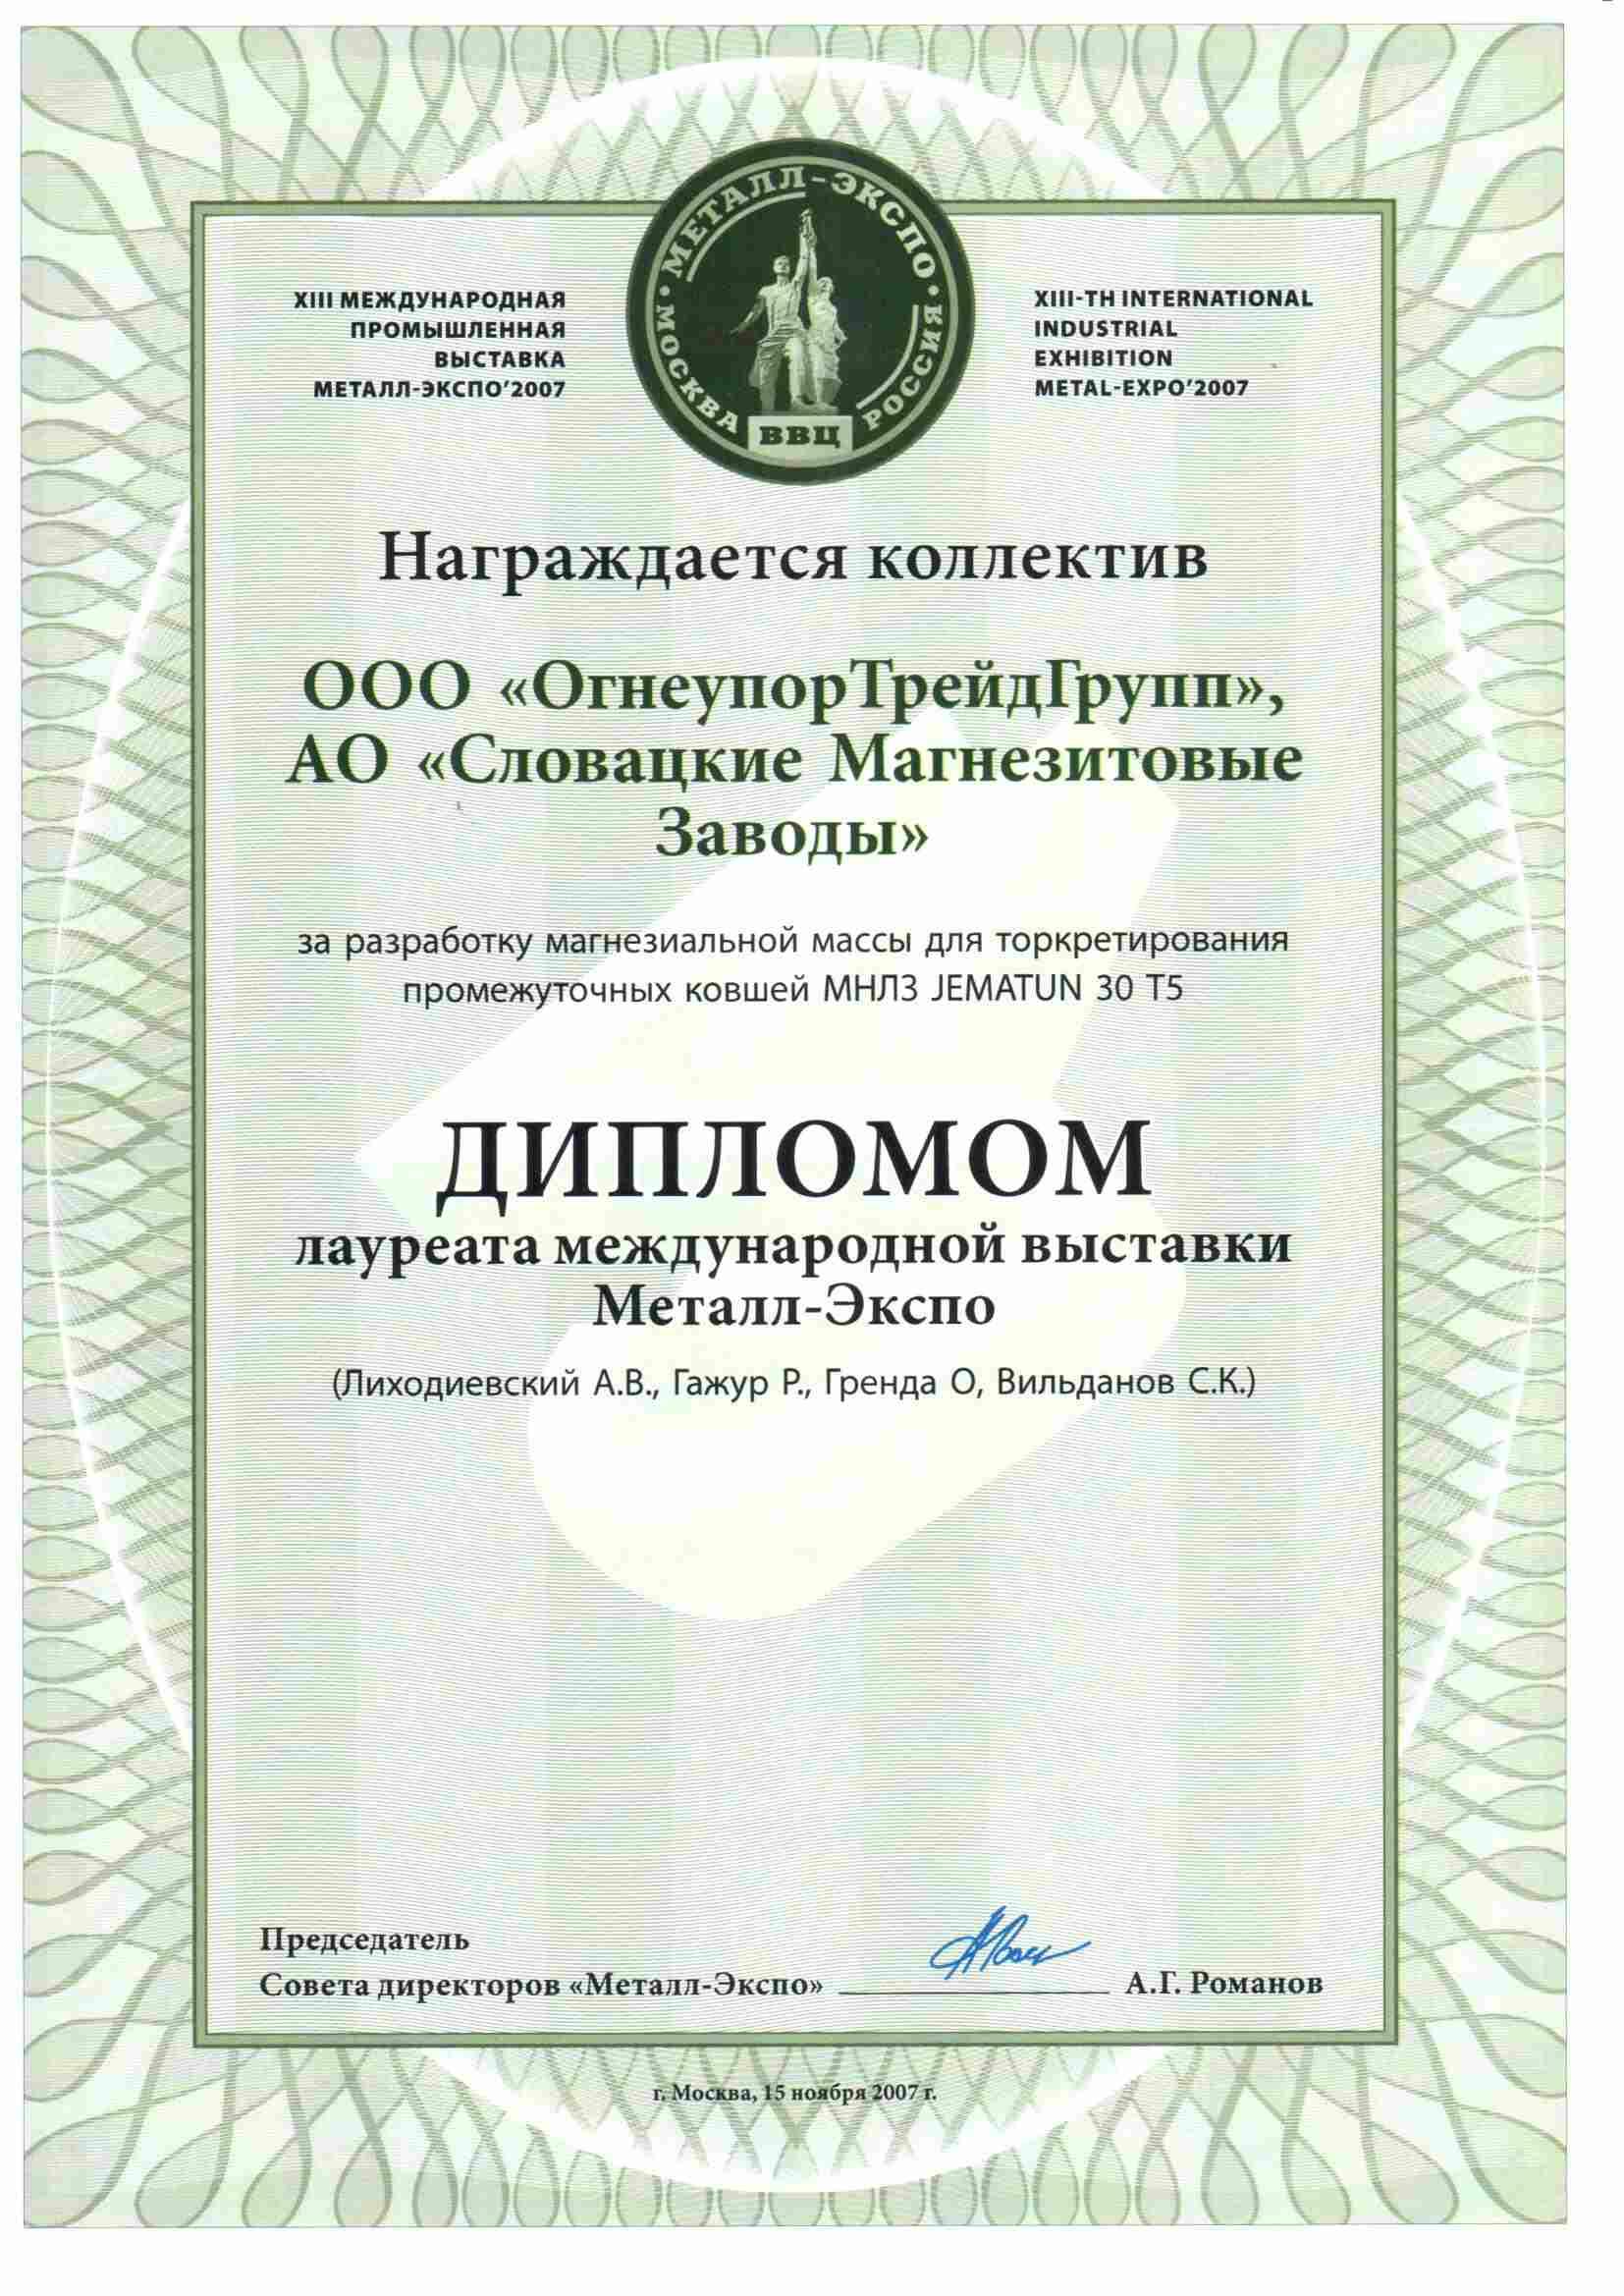 nagrada_2007